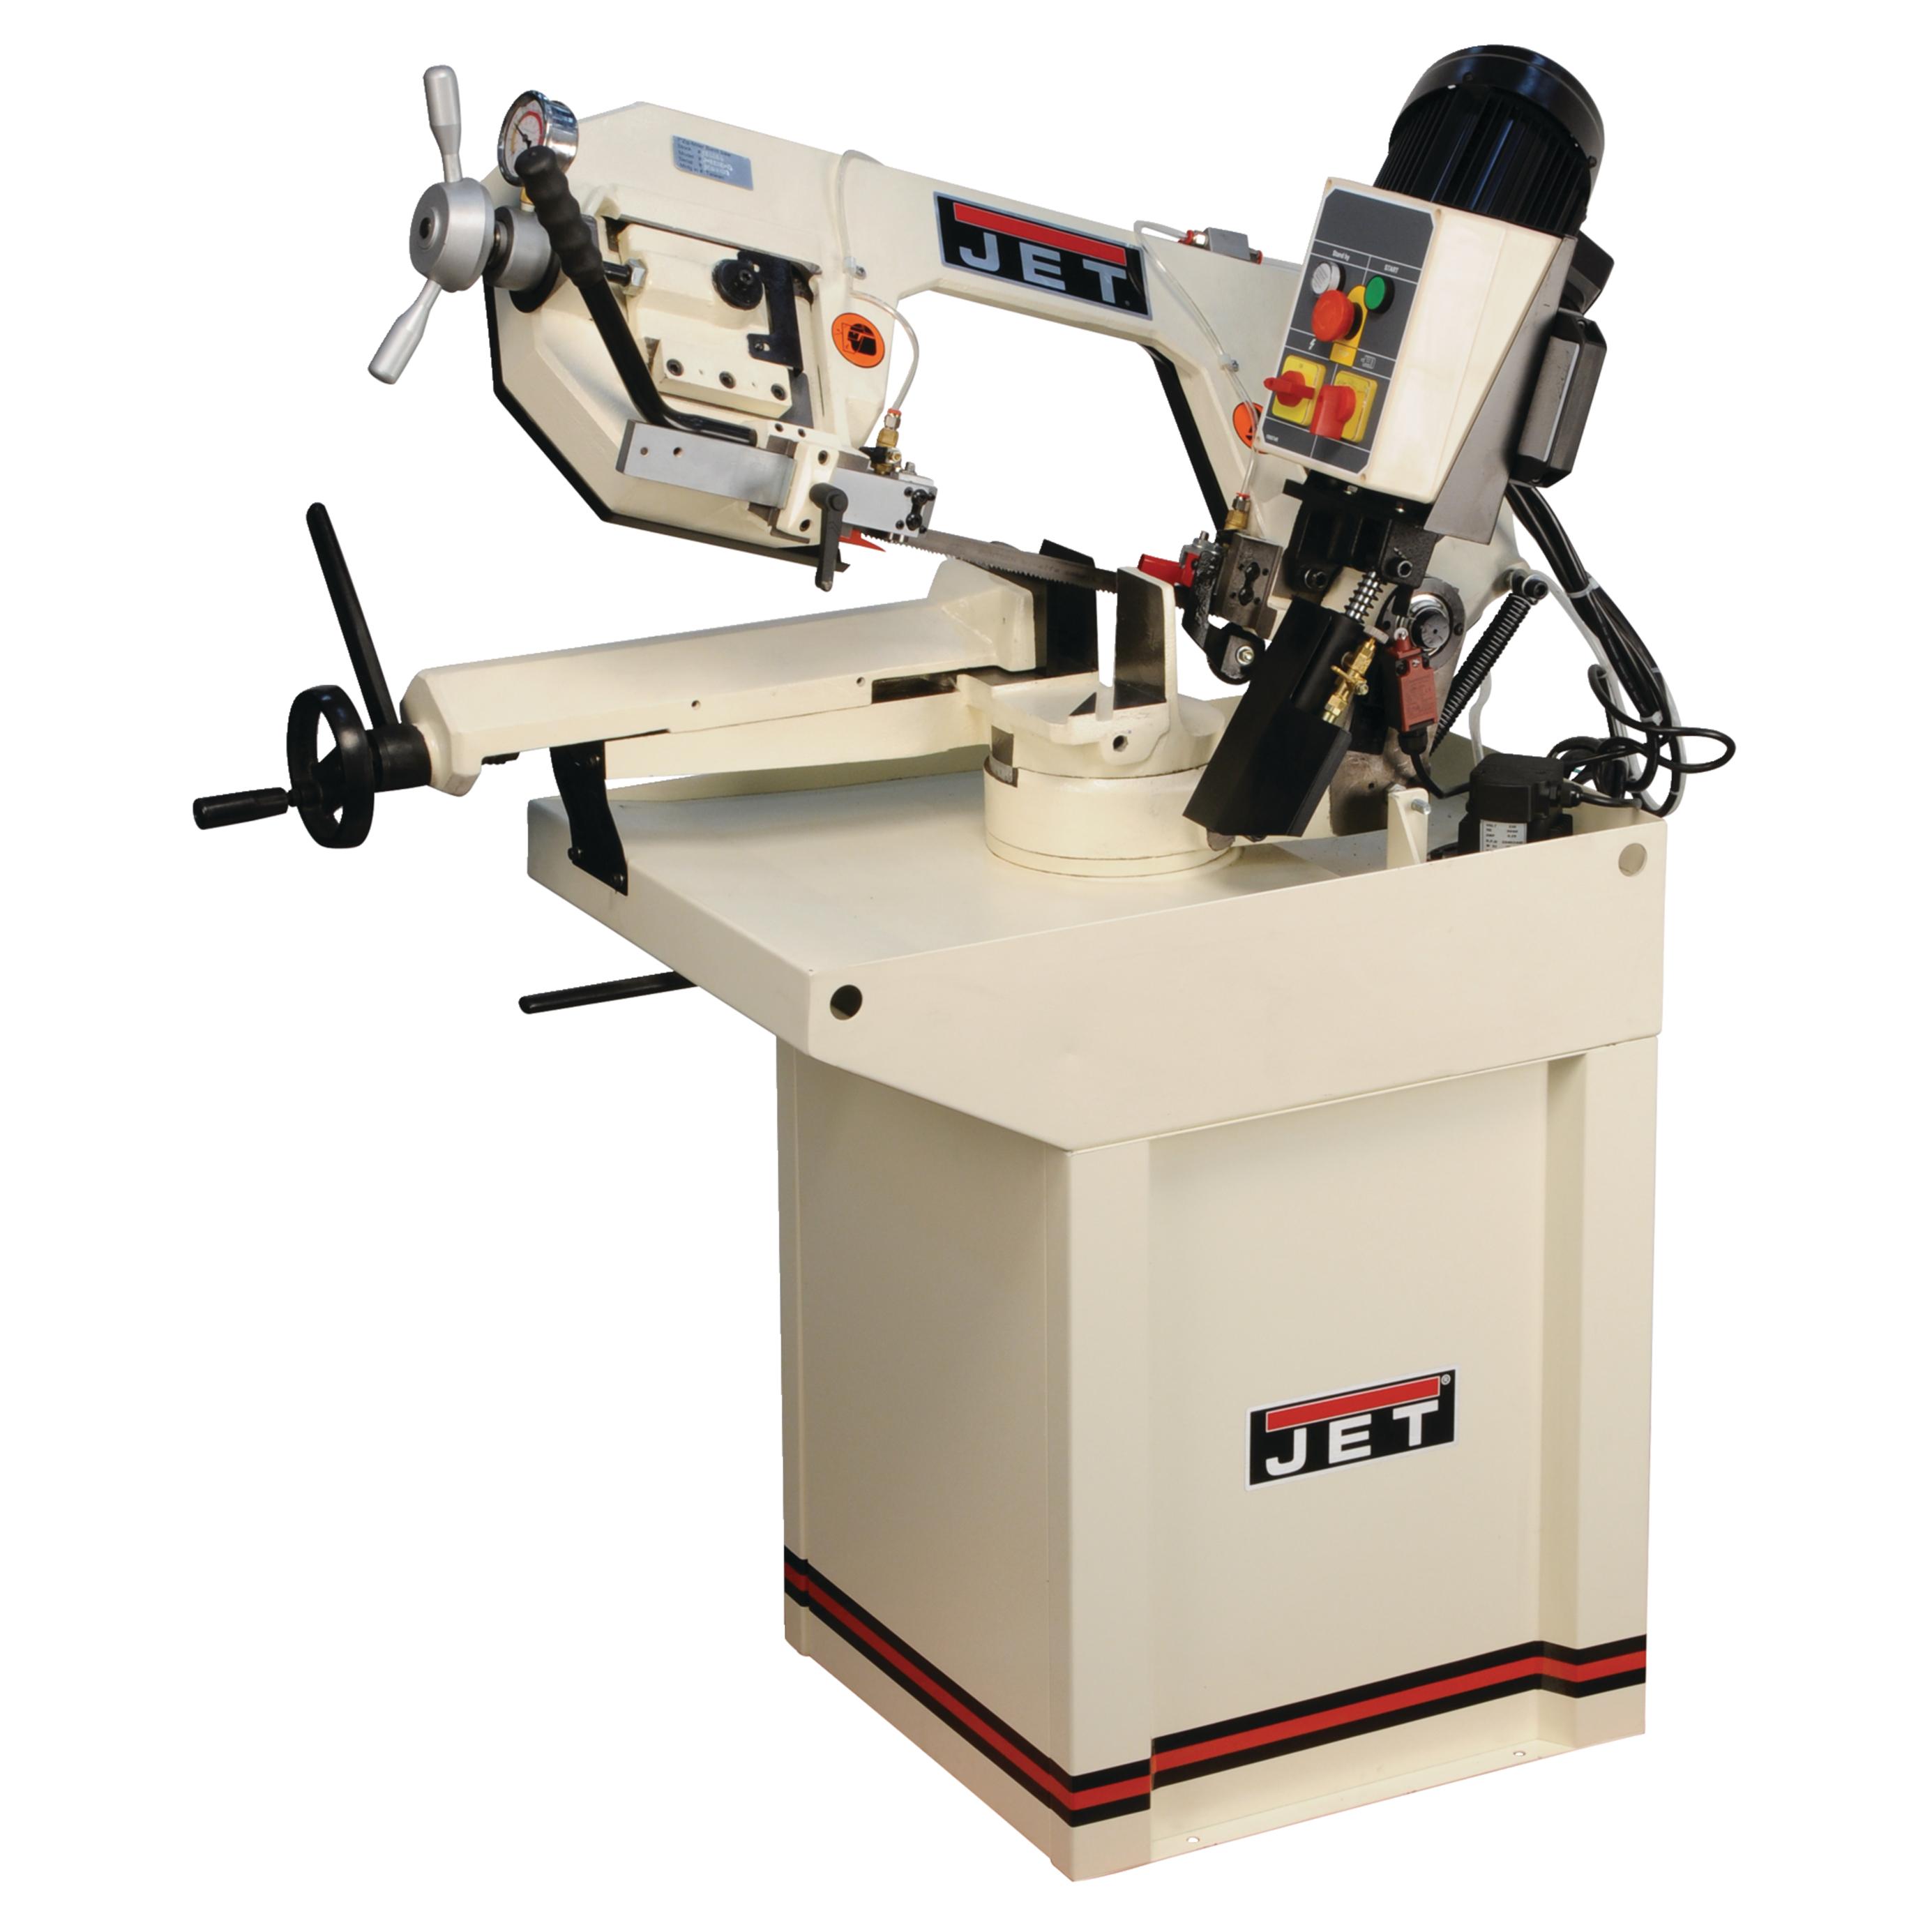 "JET J-9180-3 7"" Zip Miter Horizontal Bandsaw 230V 3PH - 414464"